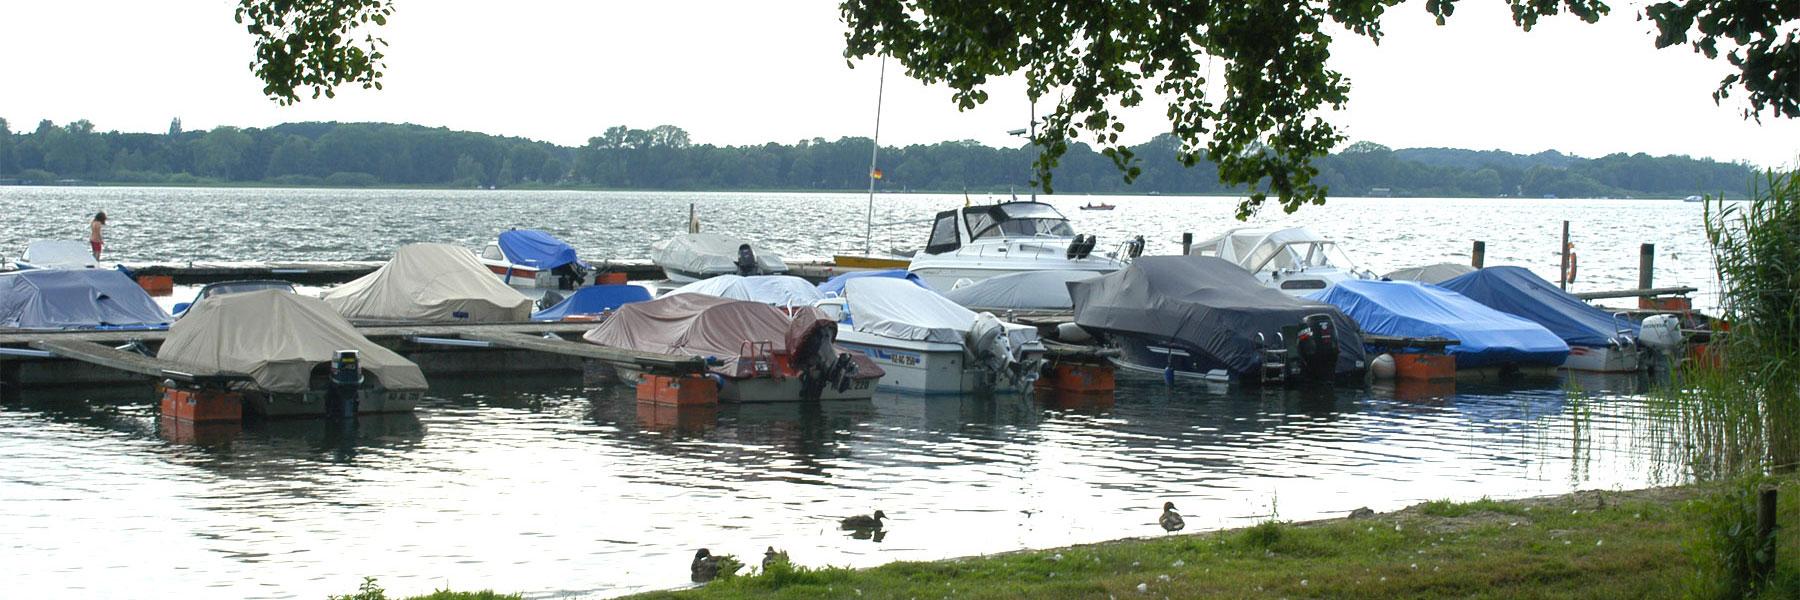 Boote - Wald- und Seeblick Camp